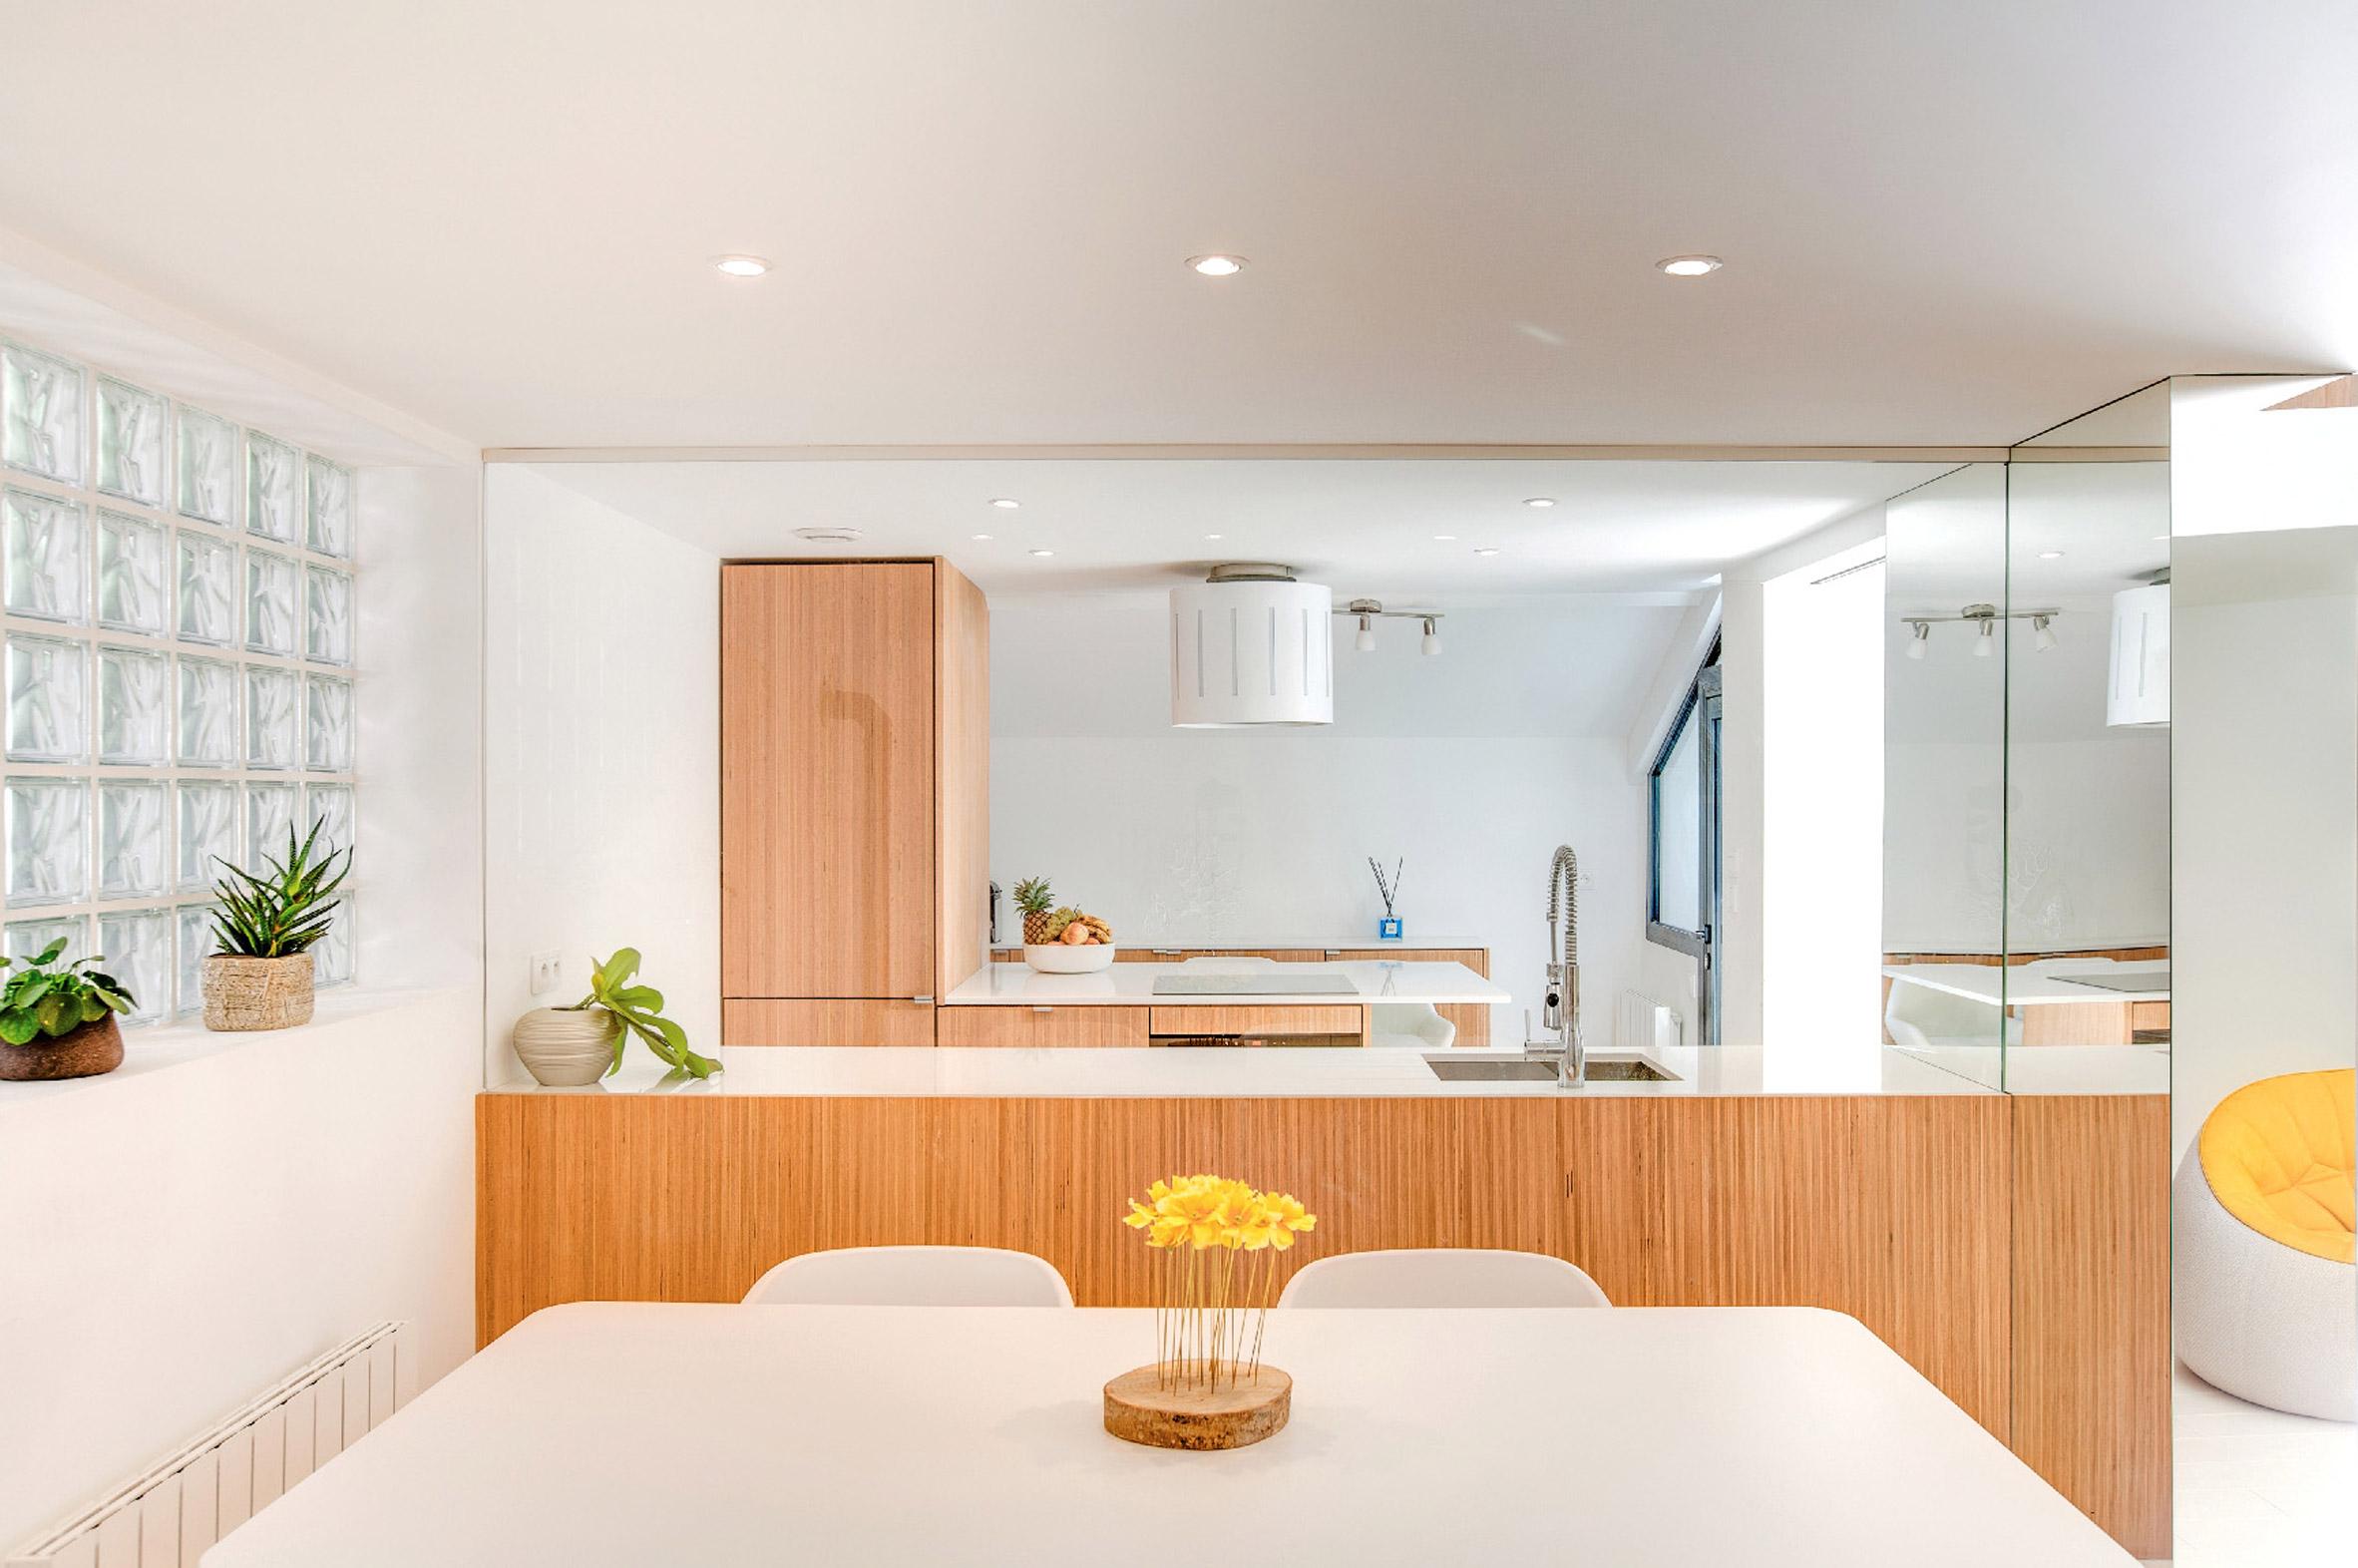 bookshelf-house-andrea-mosca-interior-paris-_dezeen_2364_col_4